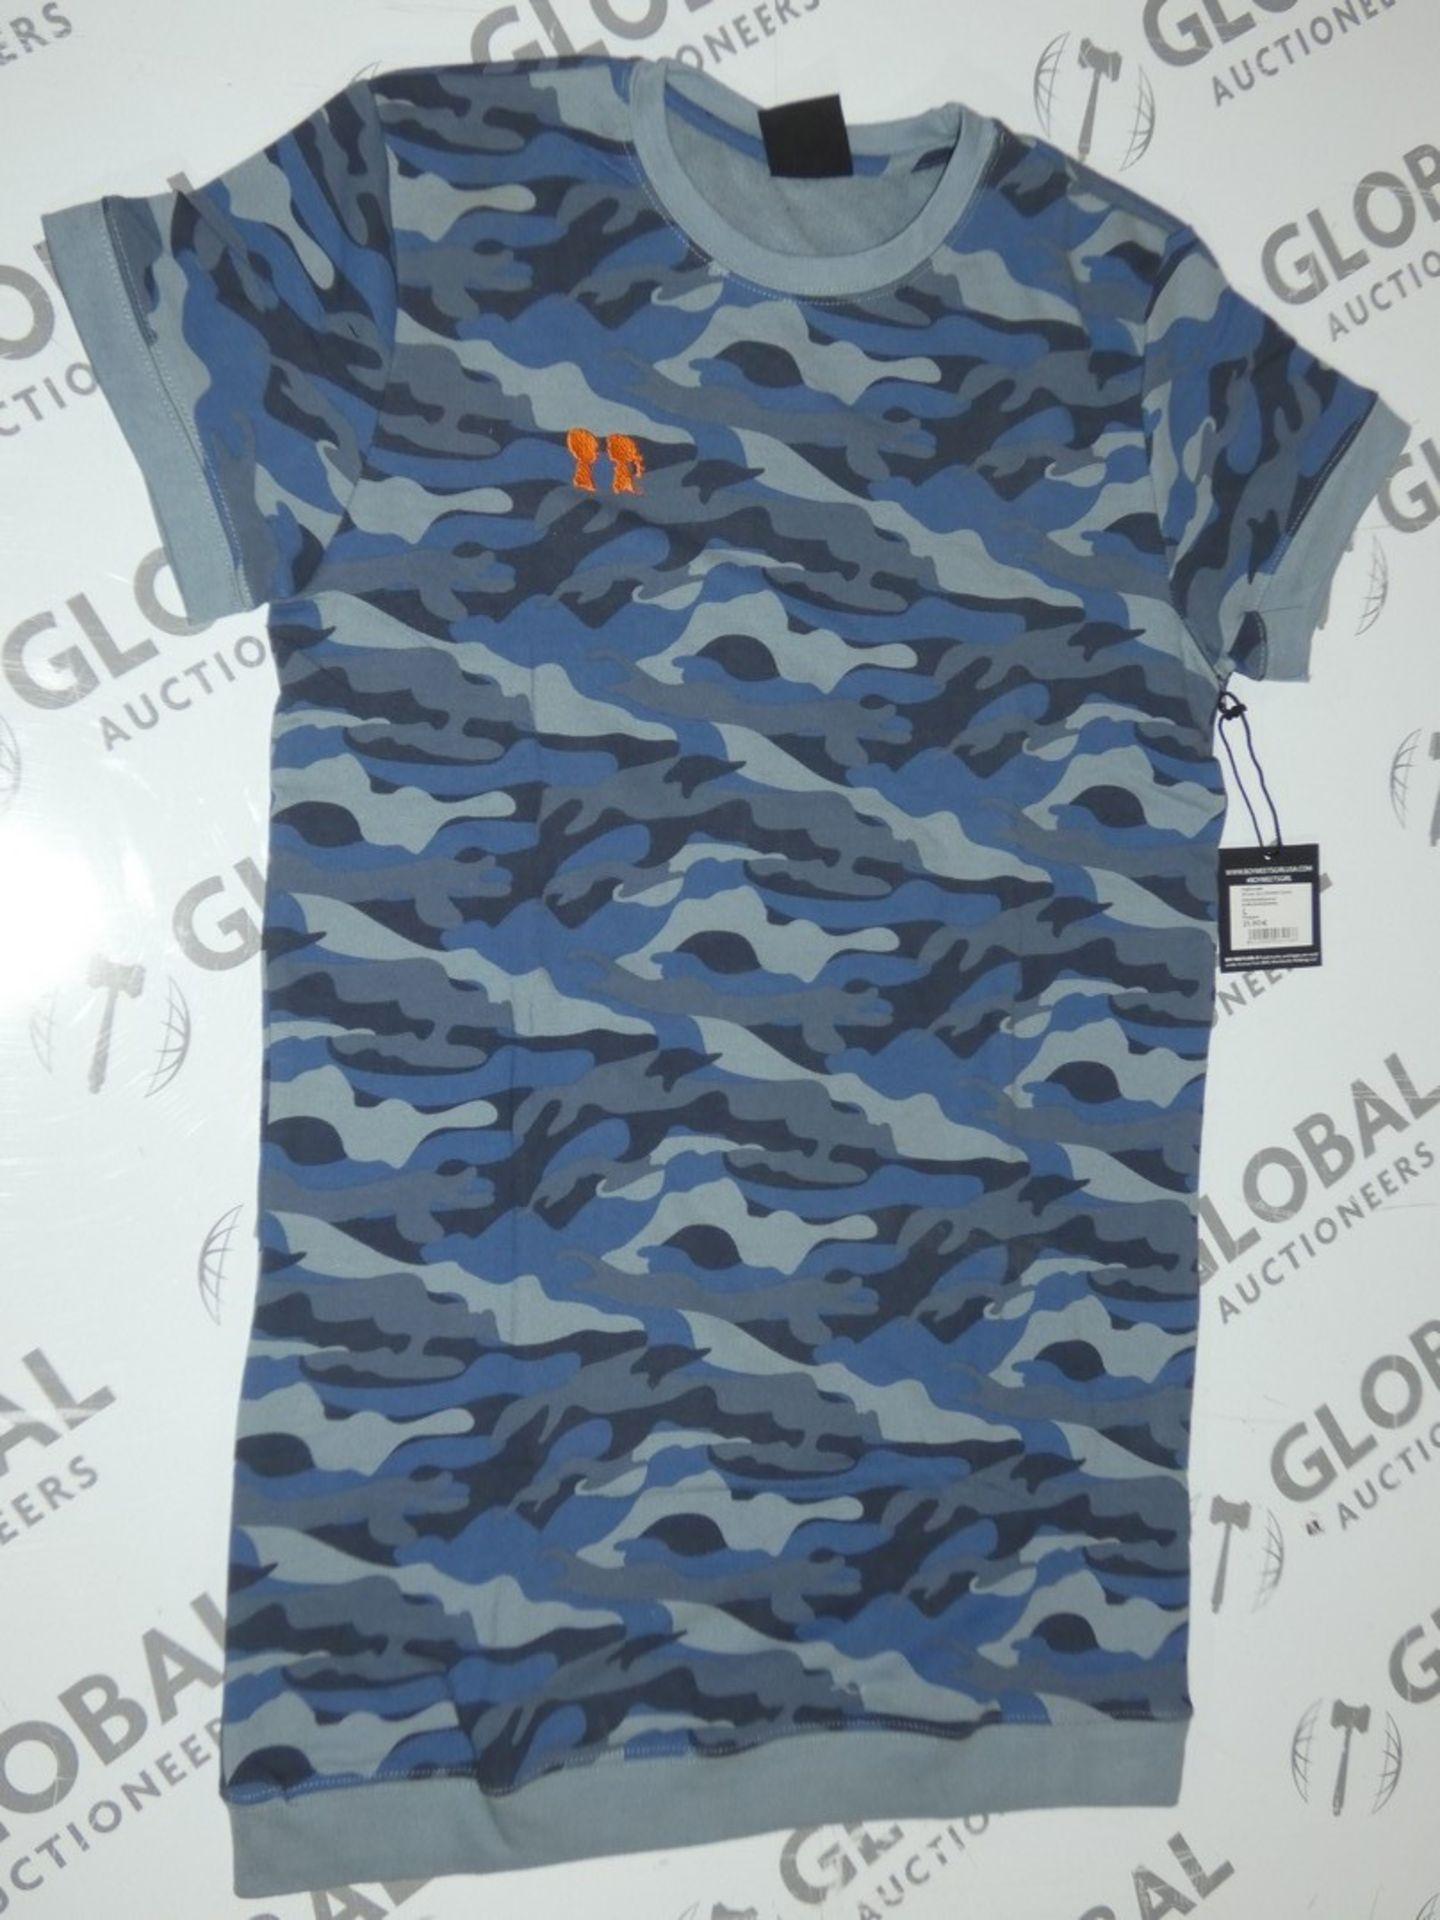 Lot 178 - Brand New Boy Meets Girl Blue Camo Oversized T-Shirts RRP £45 Each